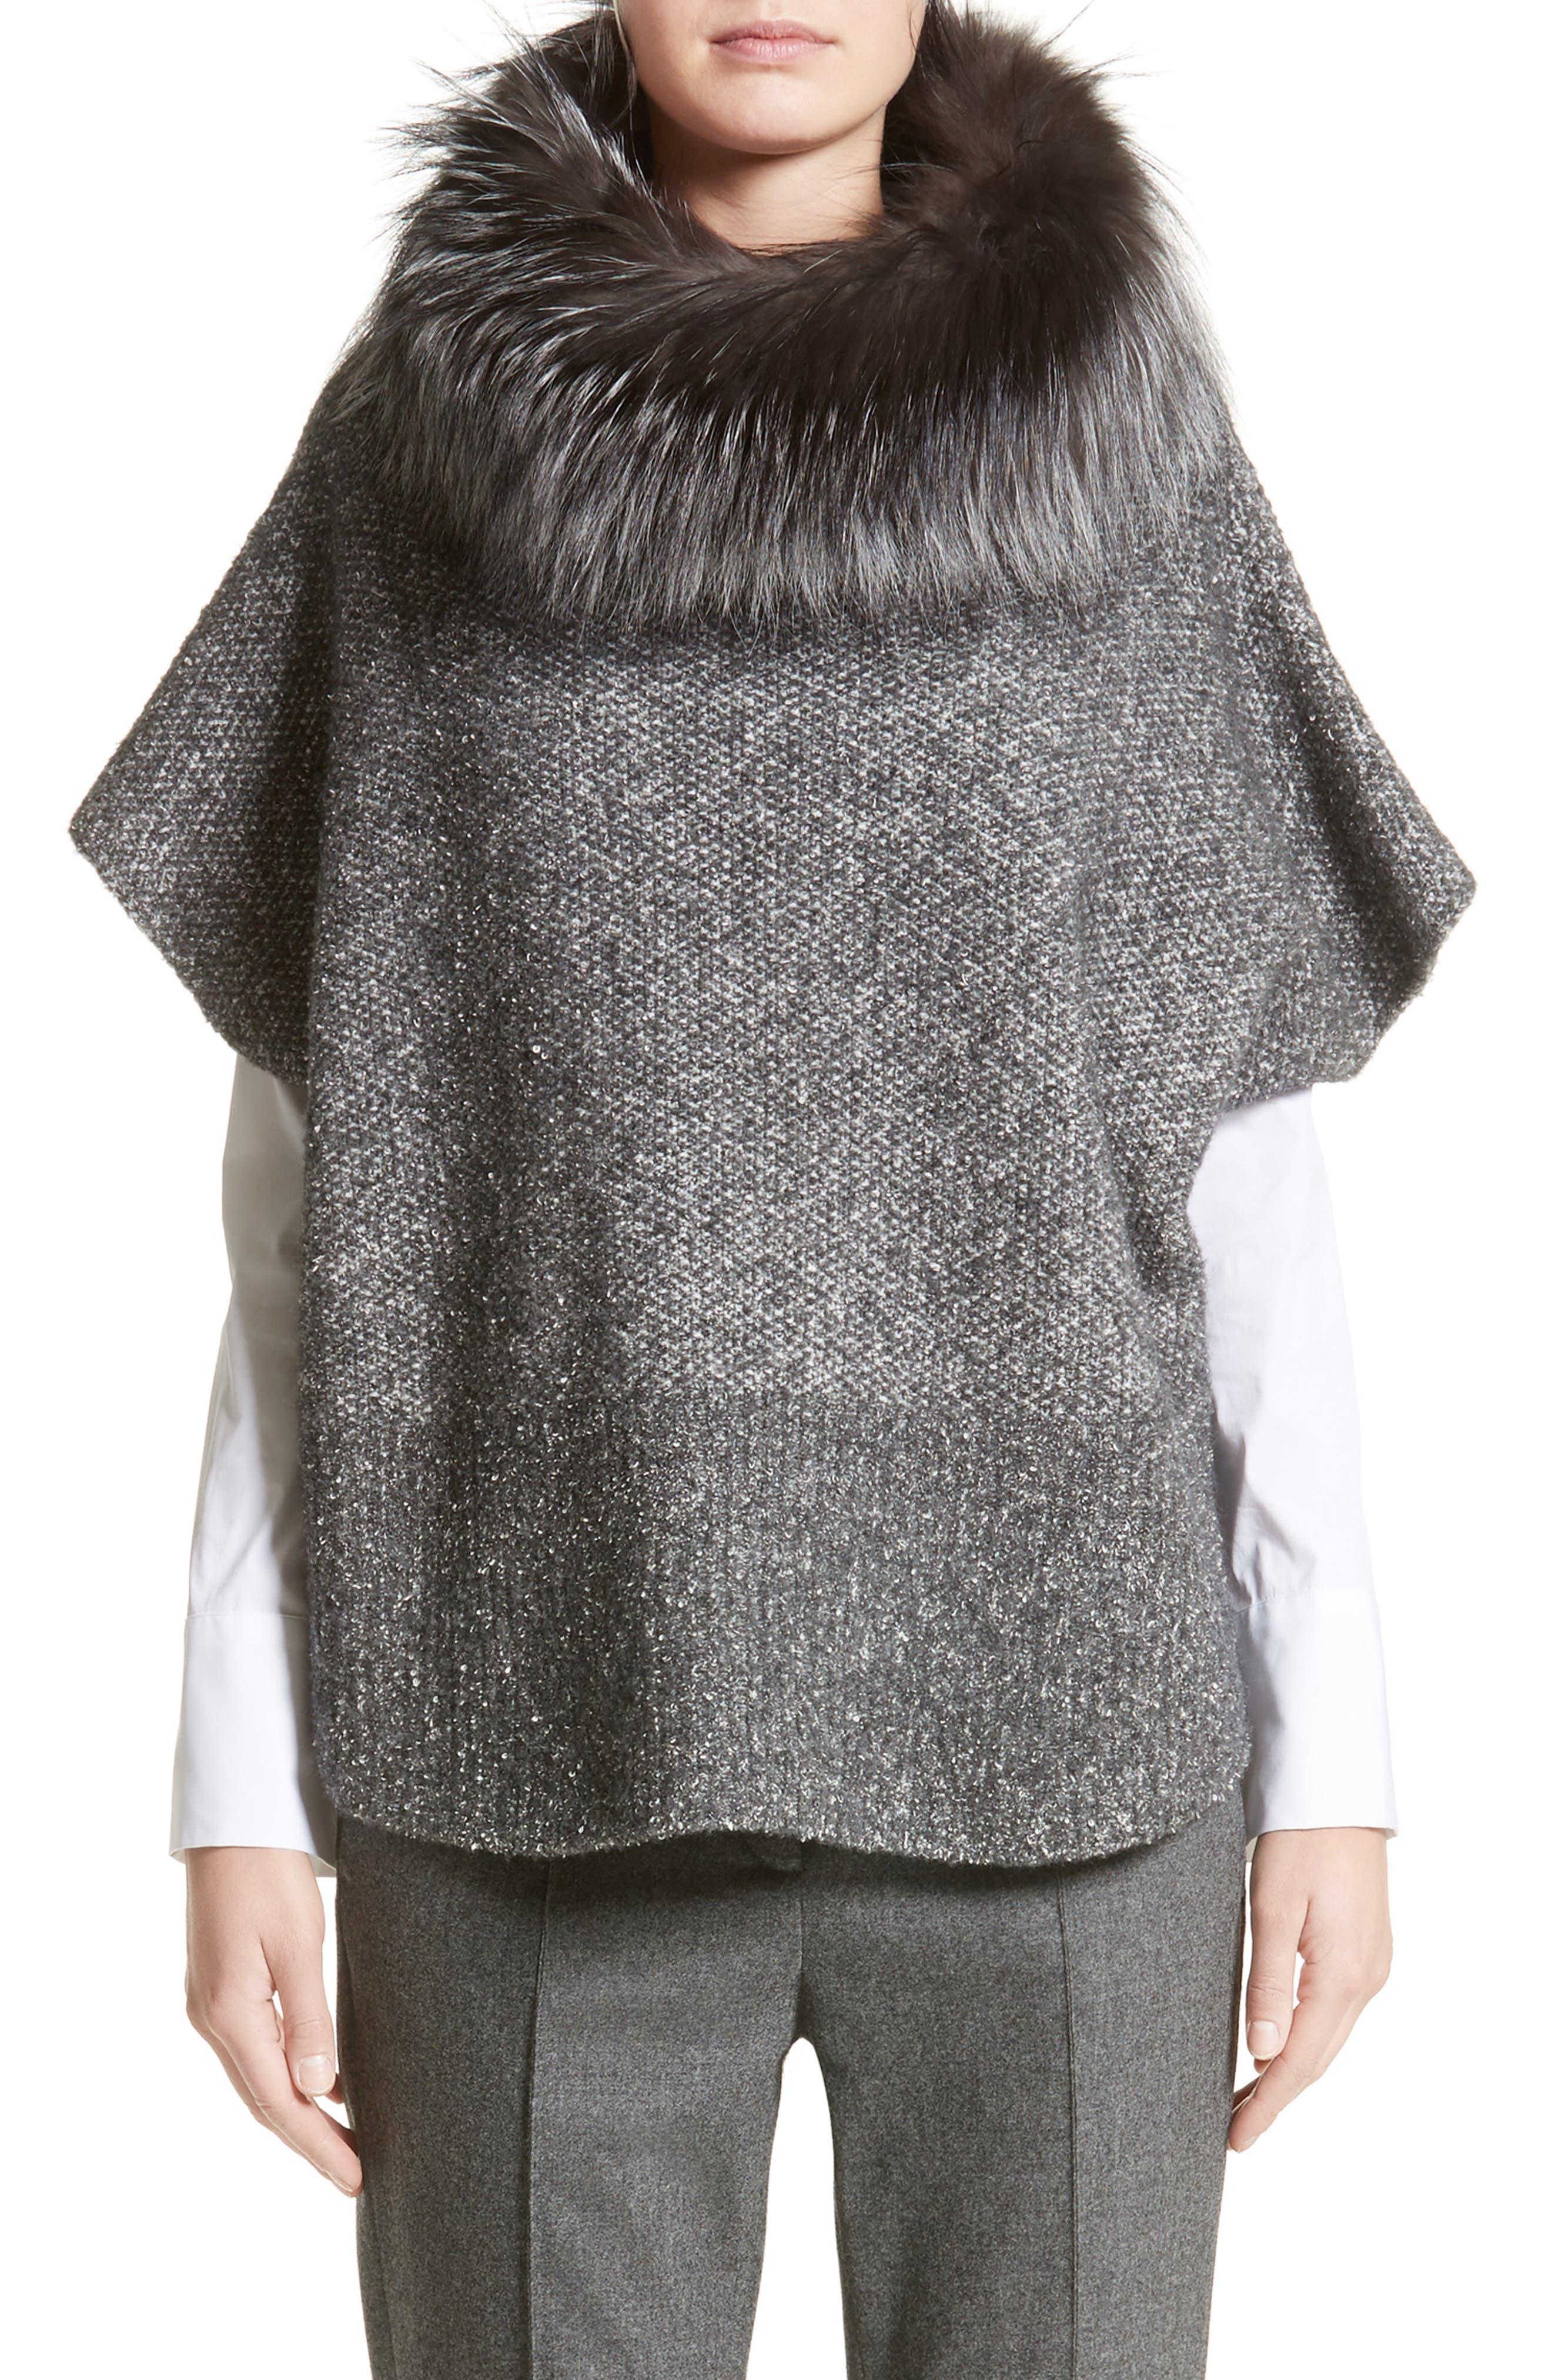 Pebble Tweed Knit Poncho with Genuine Fox Fur Collar,                         Main,                         color, Grey Multi